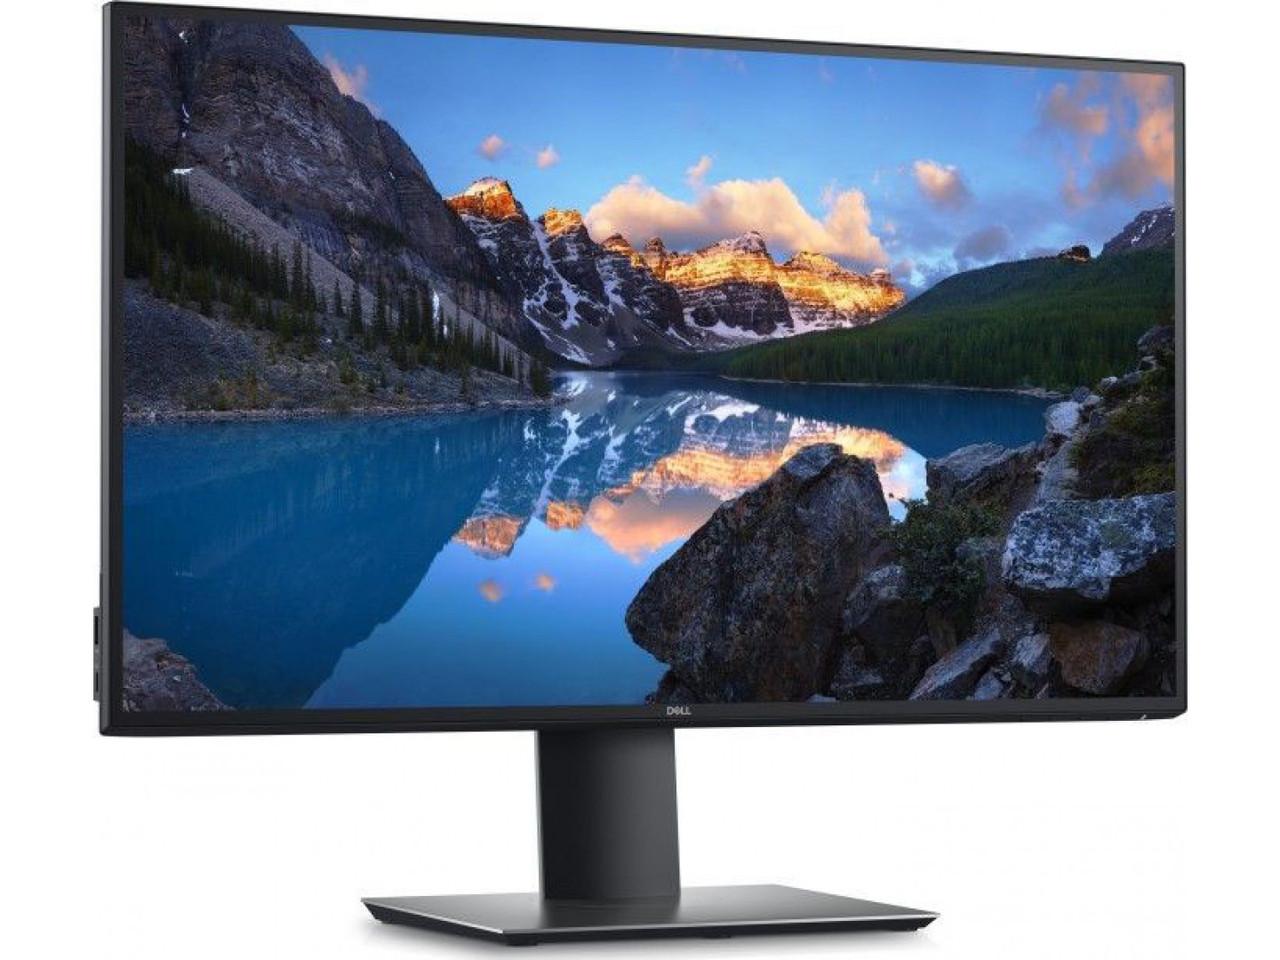 "Dell Monitor U2720Q/27""(68.47 cm)/4K (3840 x 2160) IPS (16:9)/Anti-glare treatment of the front polarizer /DP"